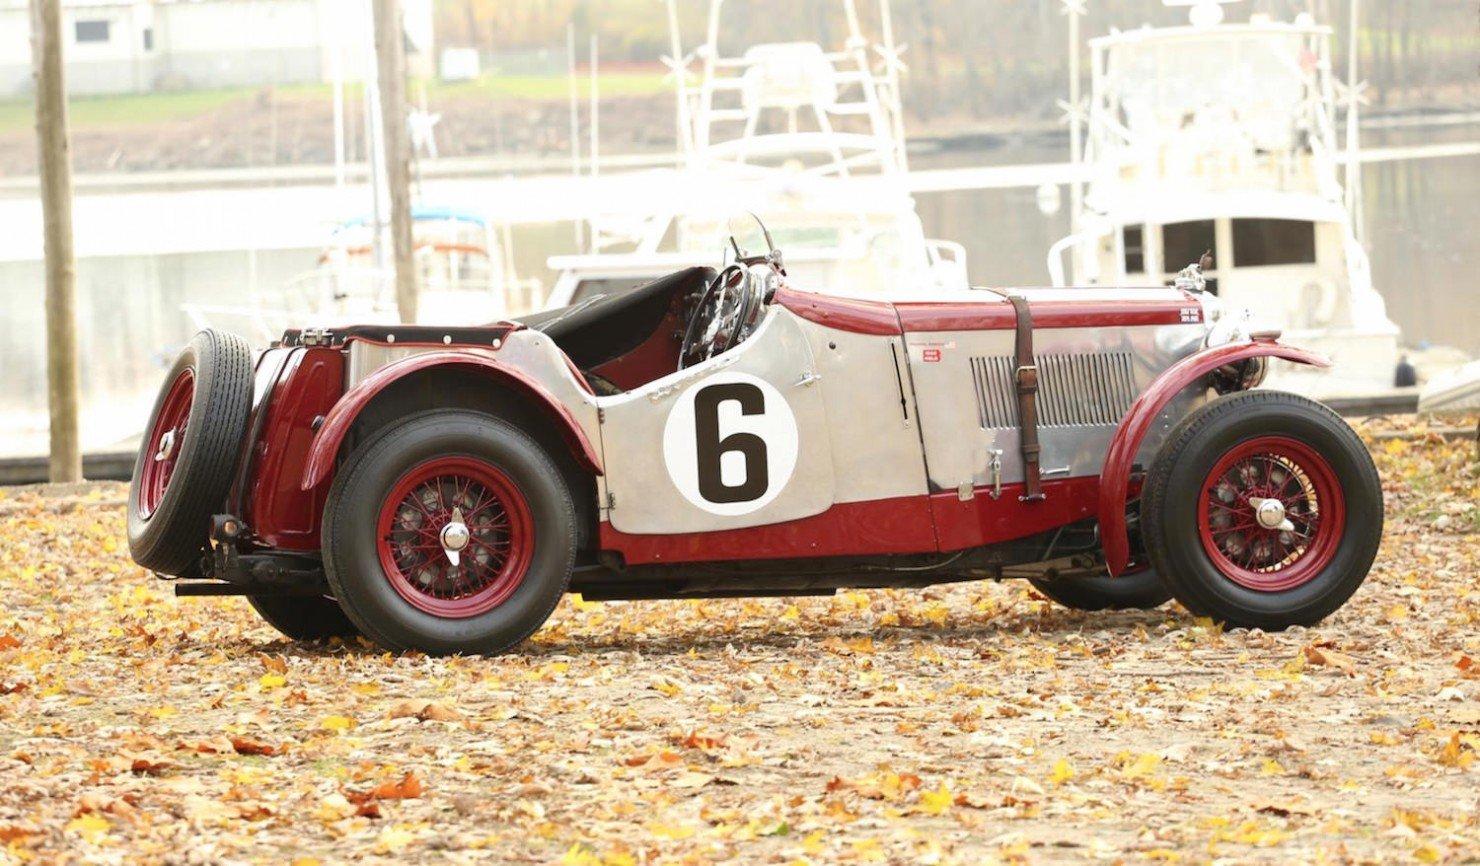 Vintage-MG-Racing-Car-6